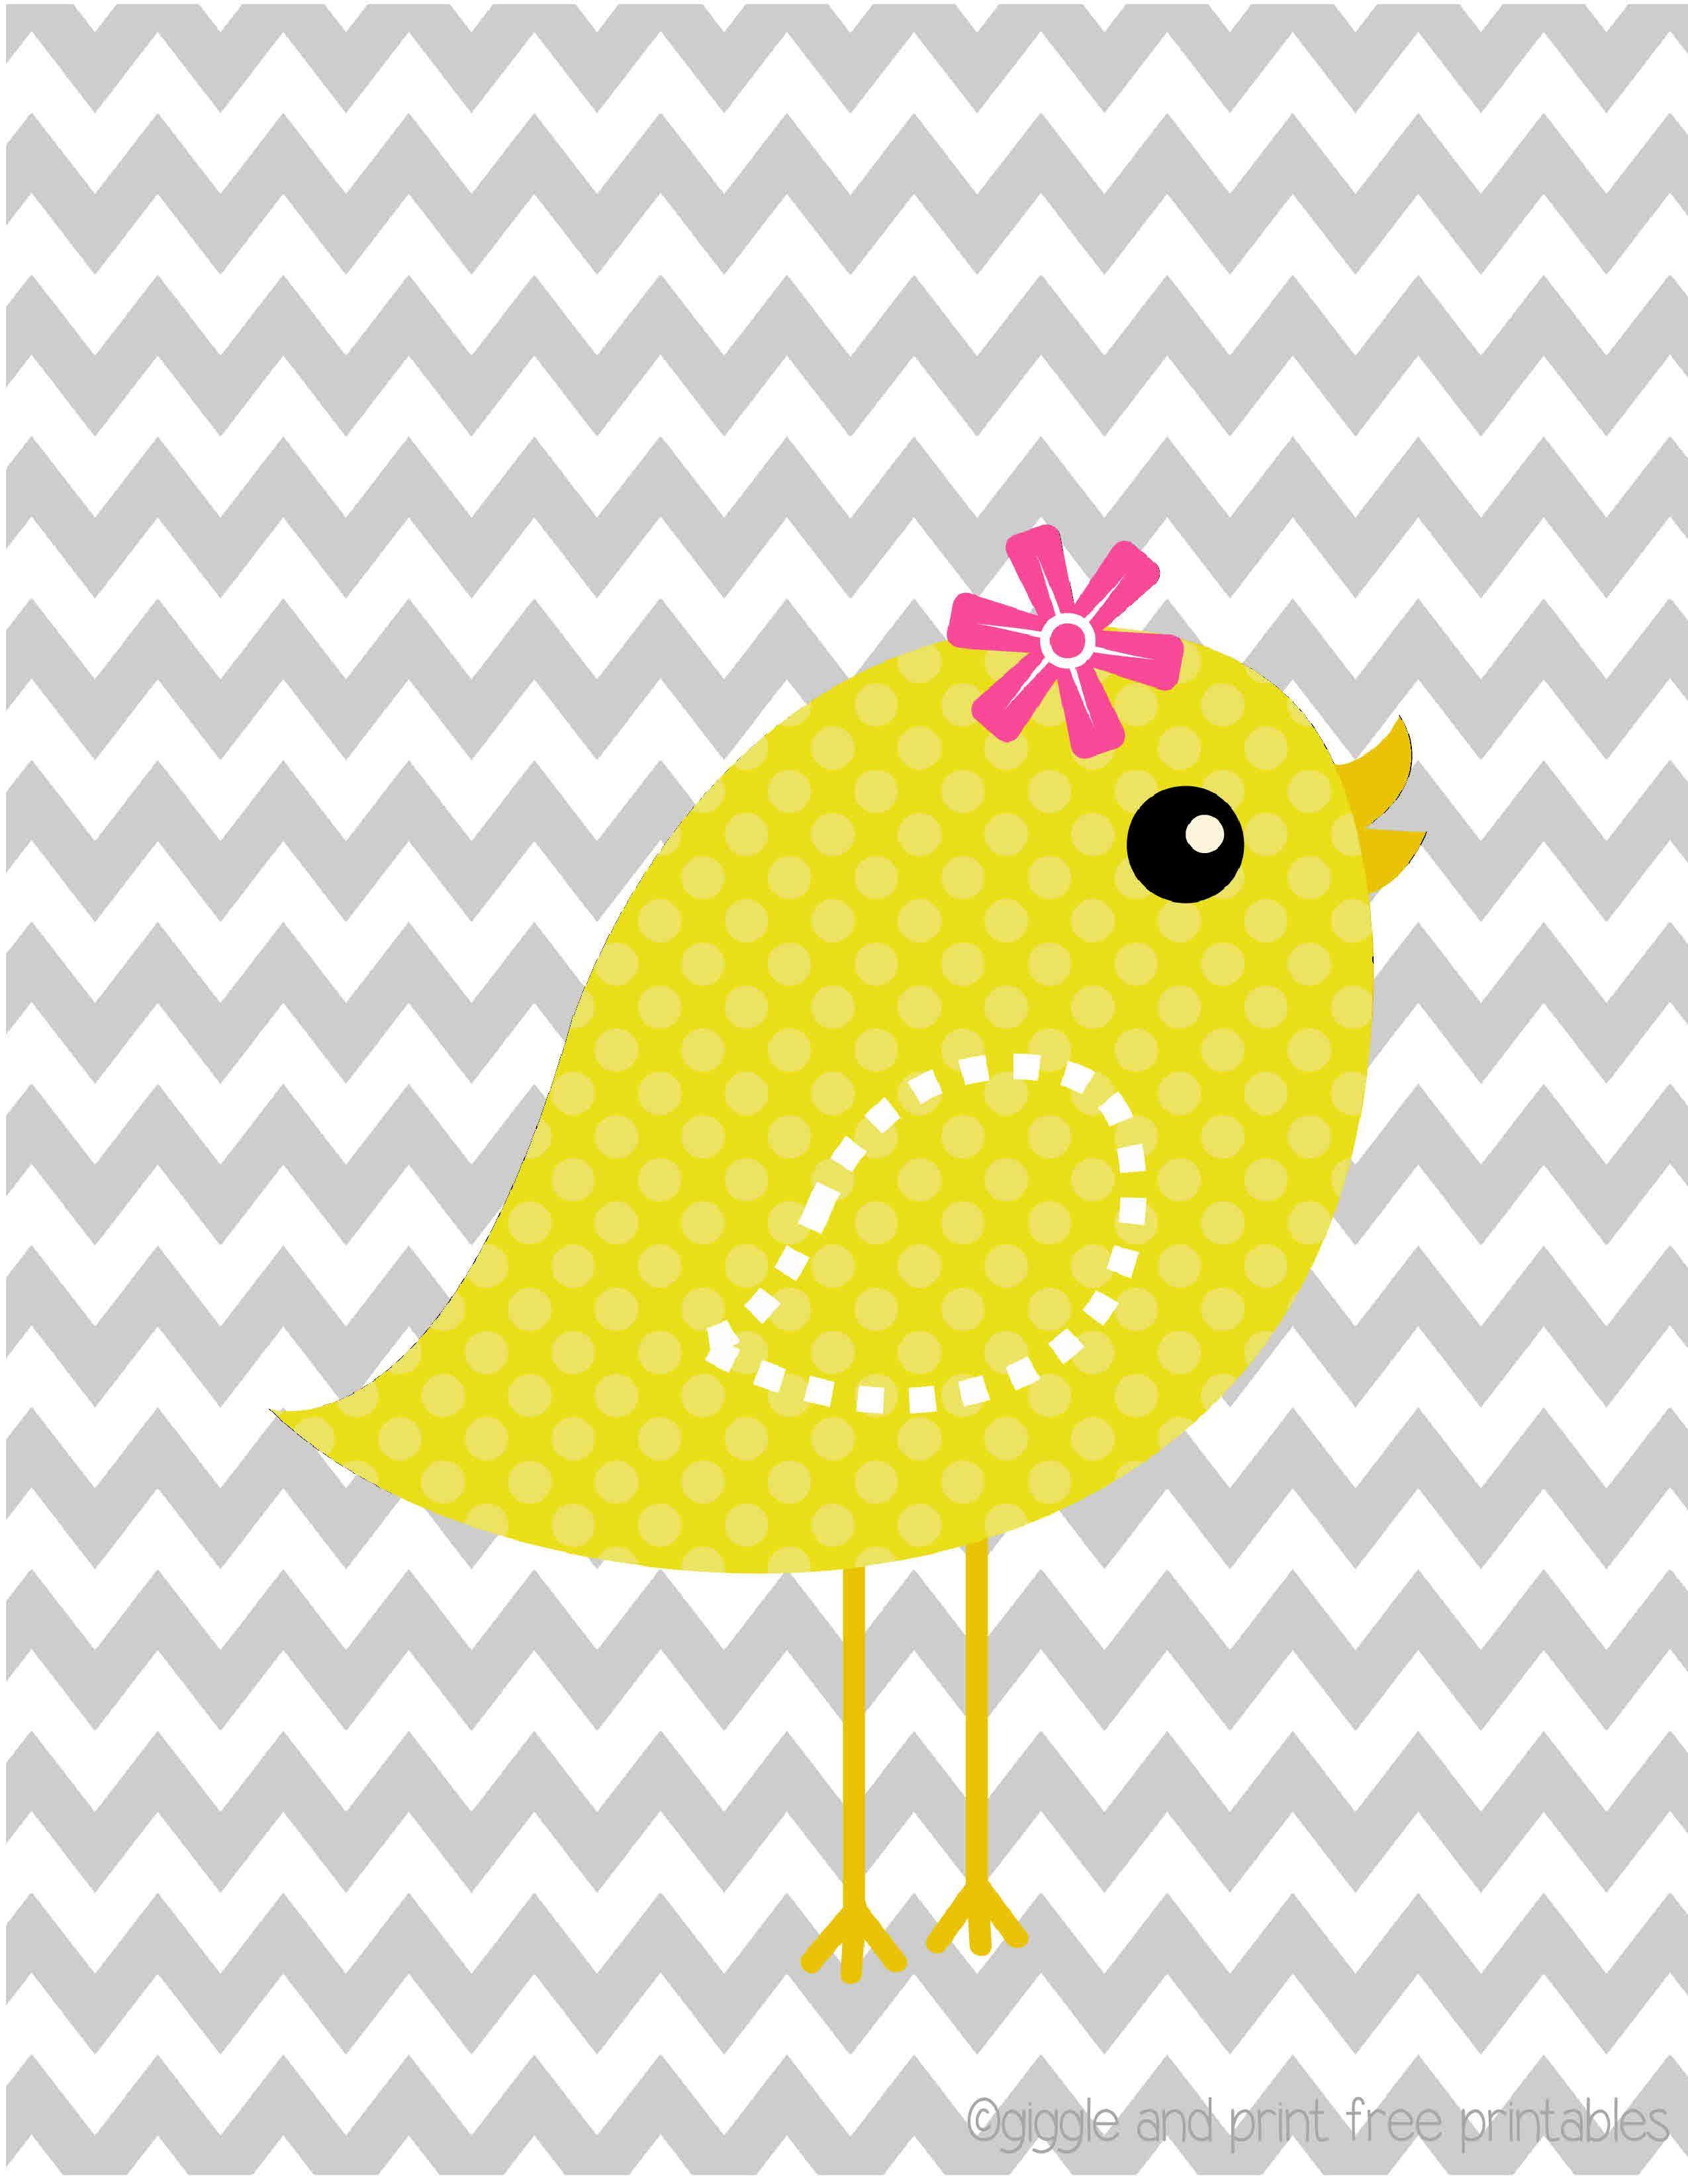 Sweet Yellow Bird Nursery Art Free Printable Giggle And Print Free Printables On Facebook And